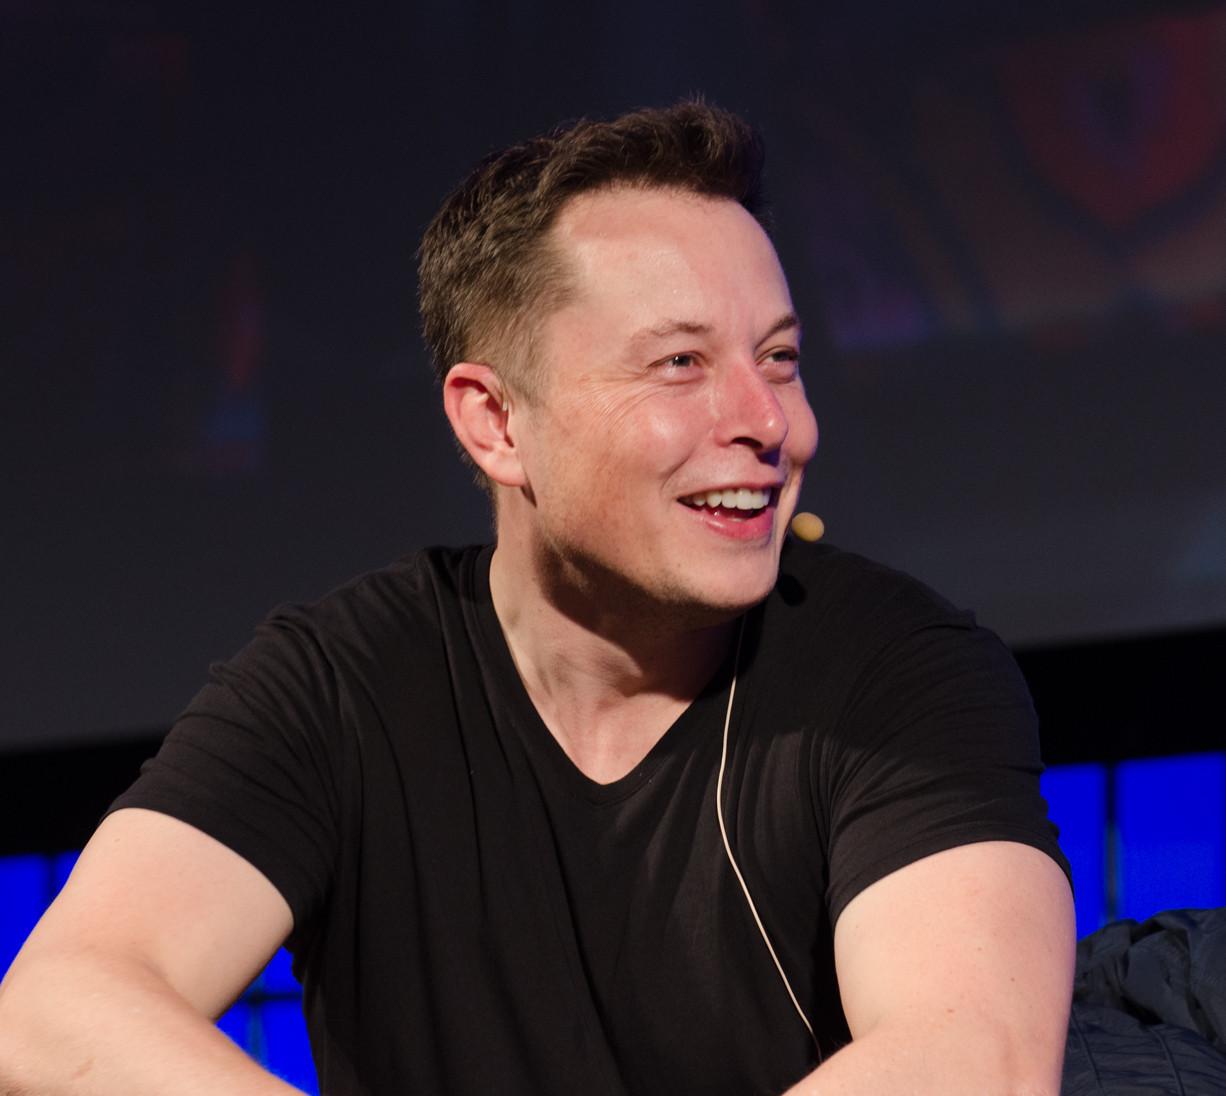 Elon_Musk_-_The_Summit_2013.jpg